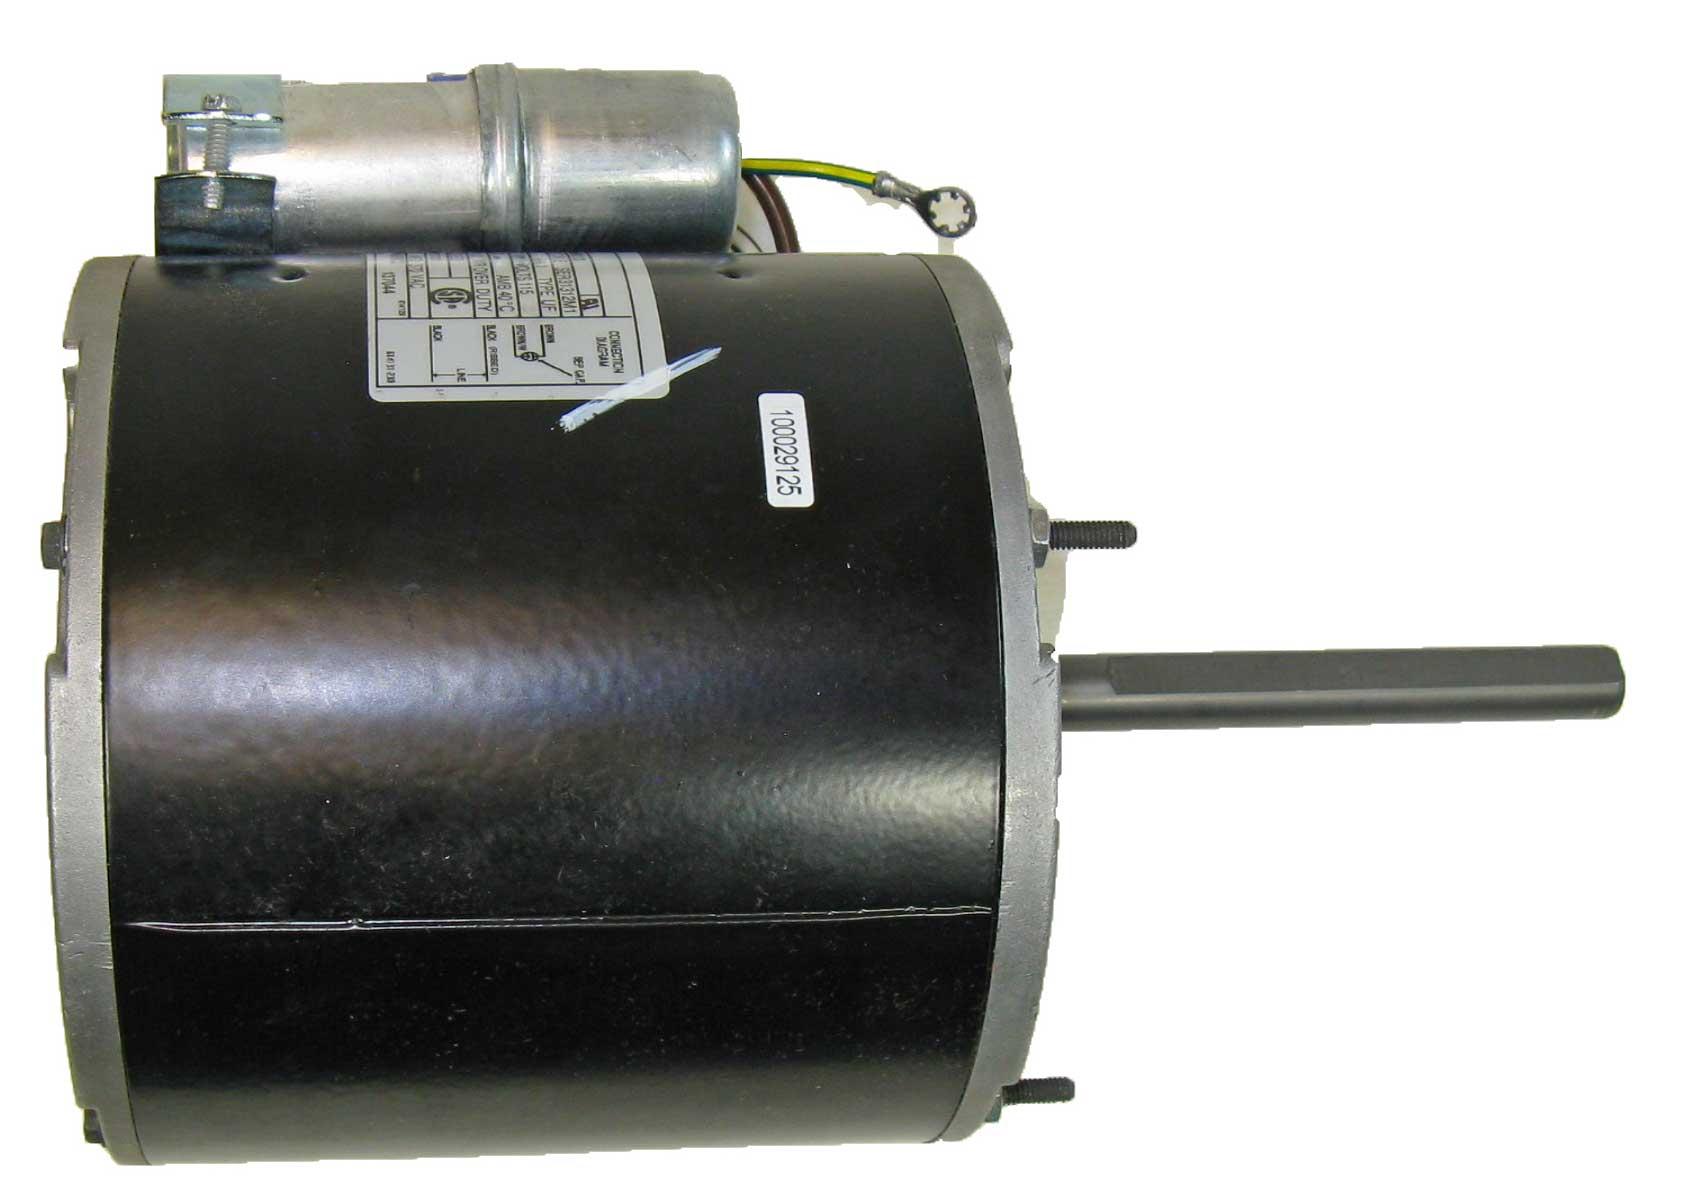 Main fan motor 137044 west brothers heating and air for Electric motor repair salt lake city